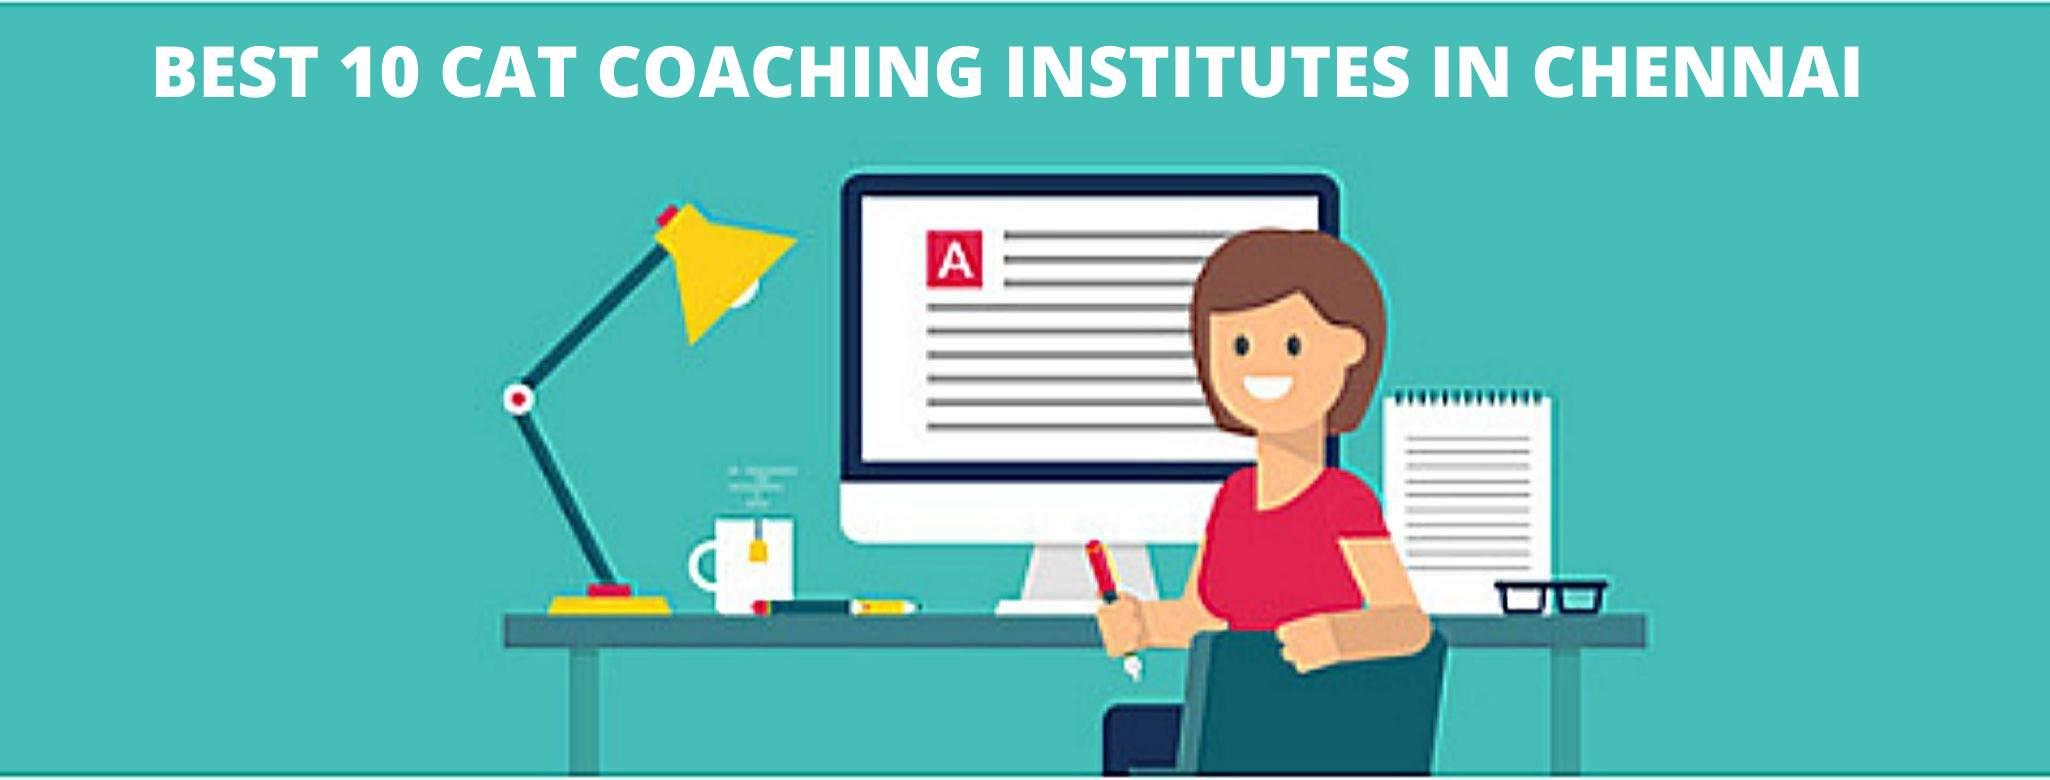 Best 10 CAT Coaching institutes in Chennai